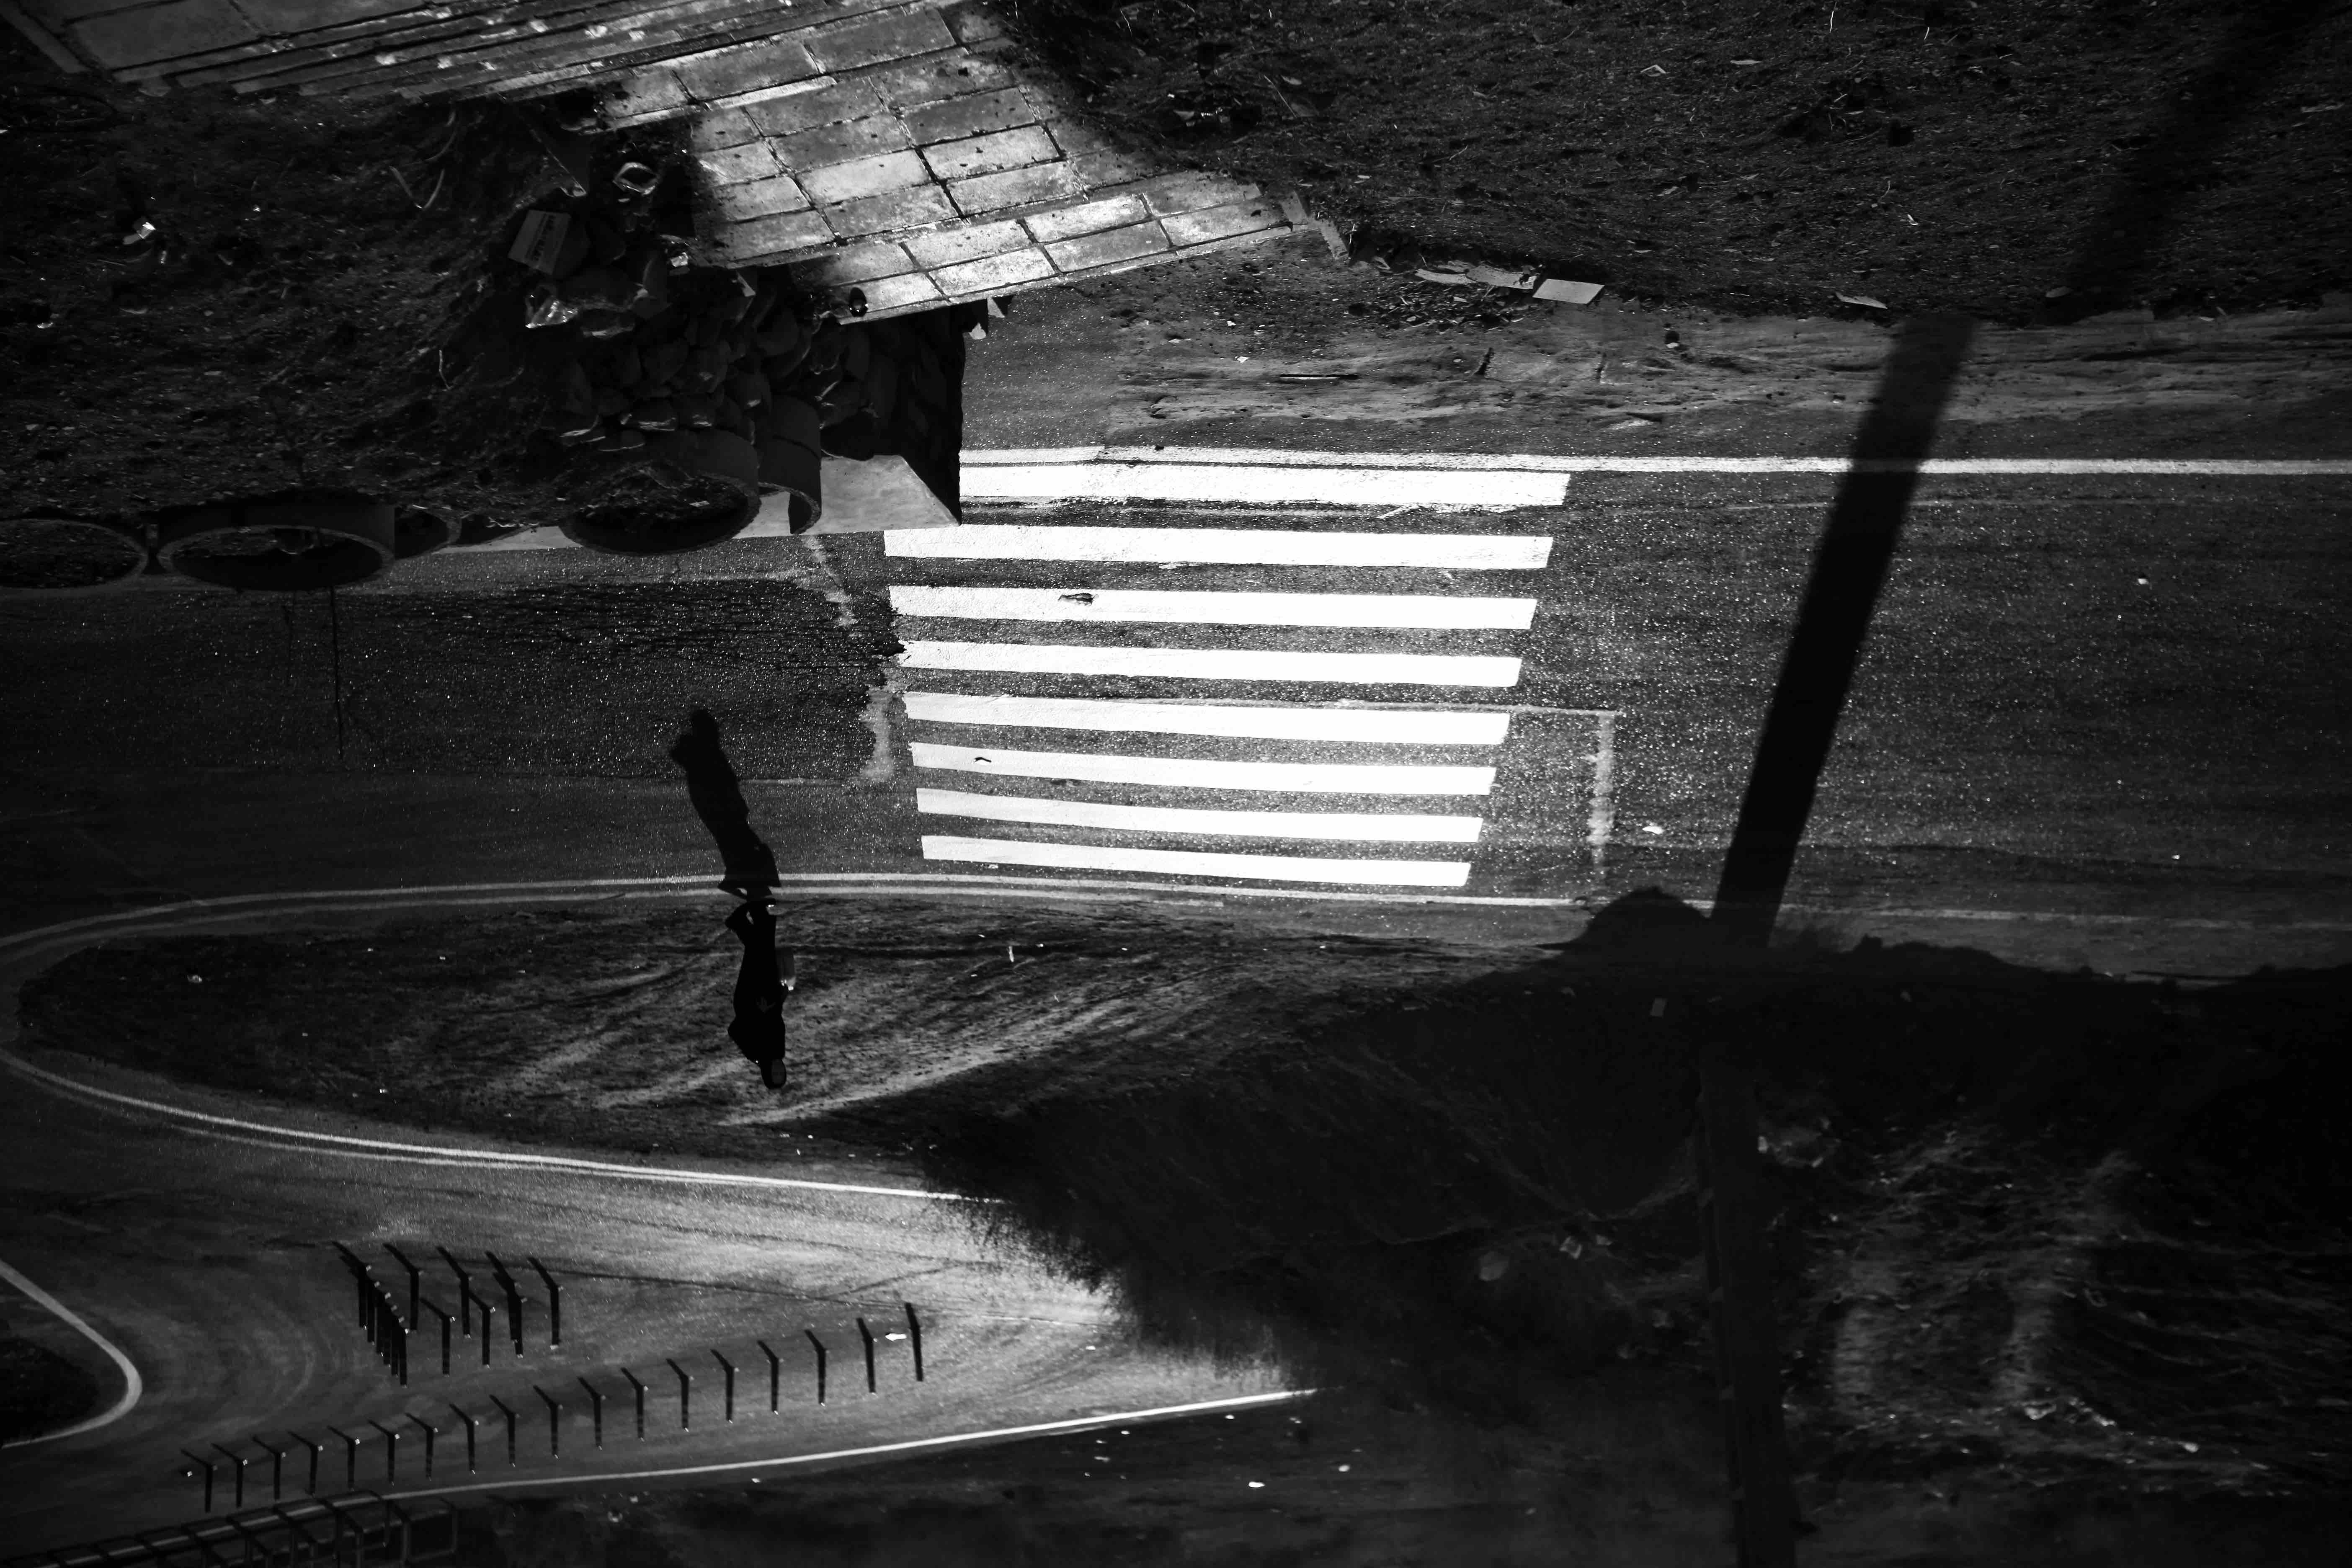 Untitled (6)_ The Life Of Shadows Series - Nehdaran_ Dana